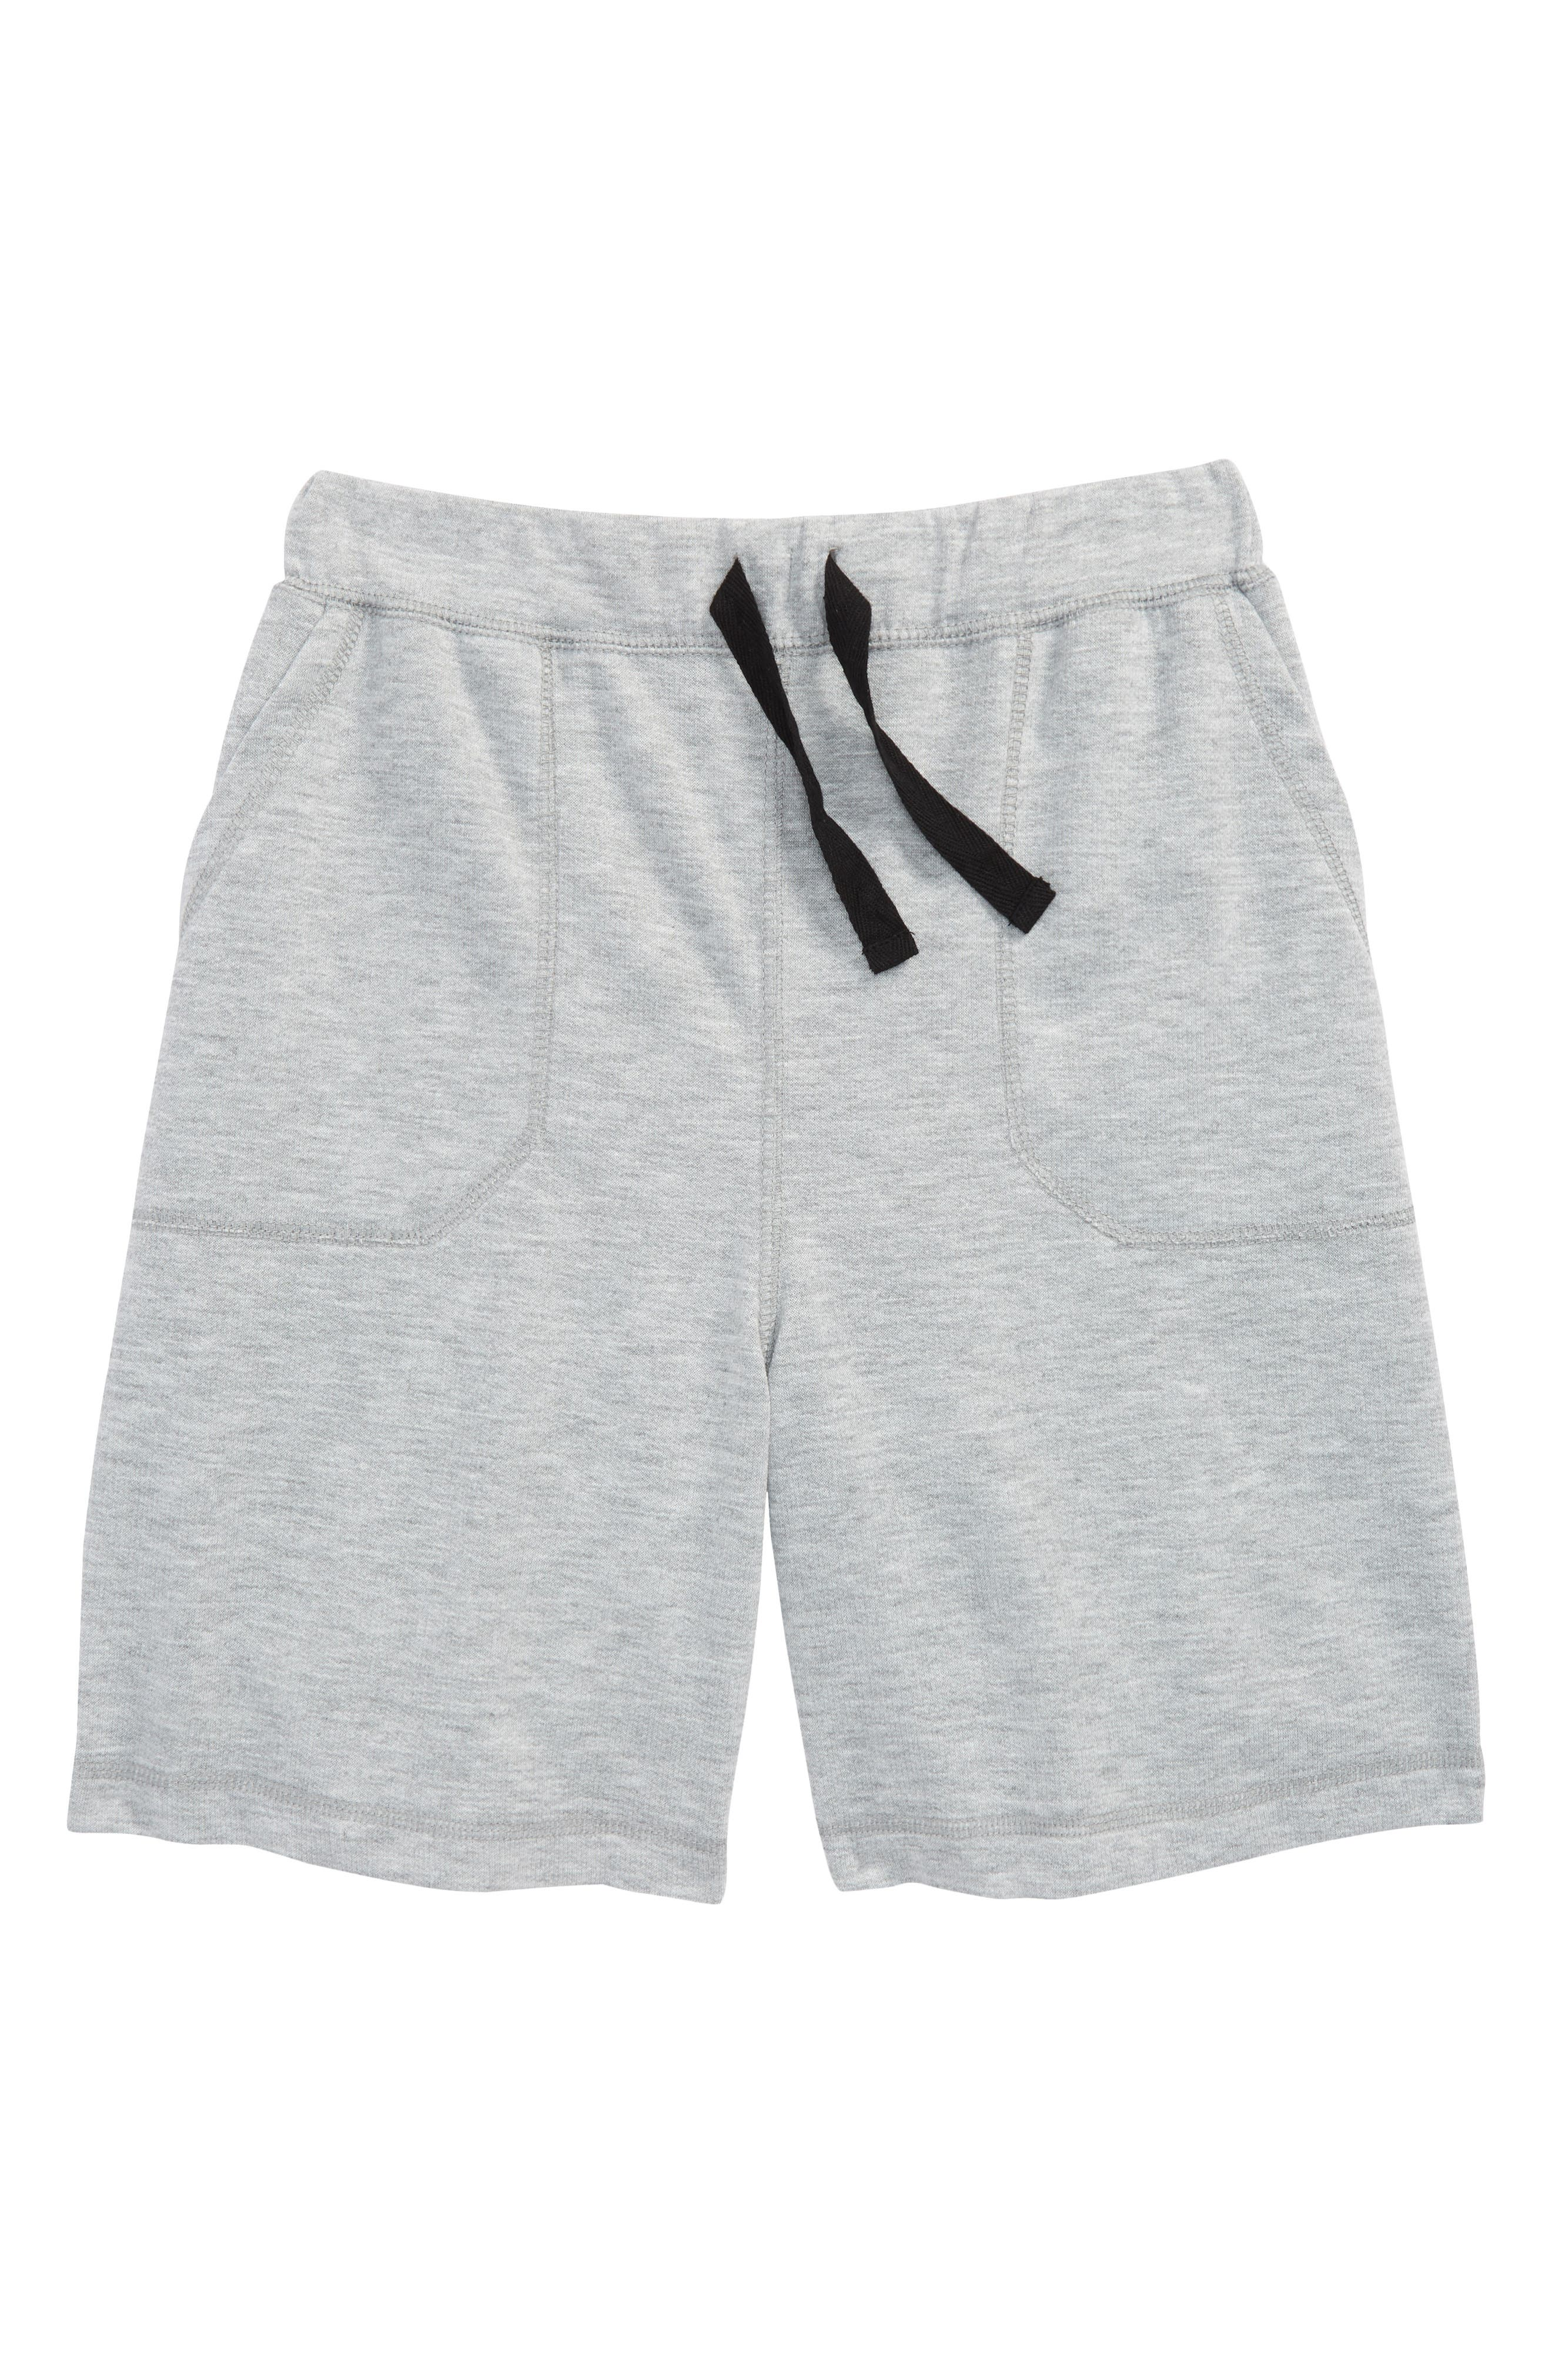 Soft Sleep Shorts,                         Main,                         color, 030